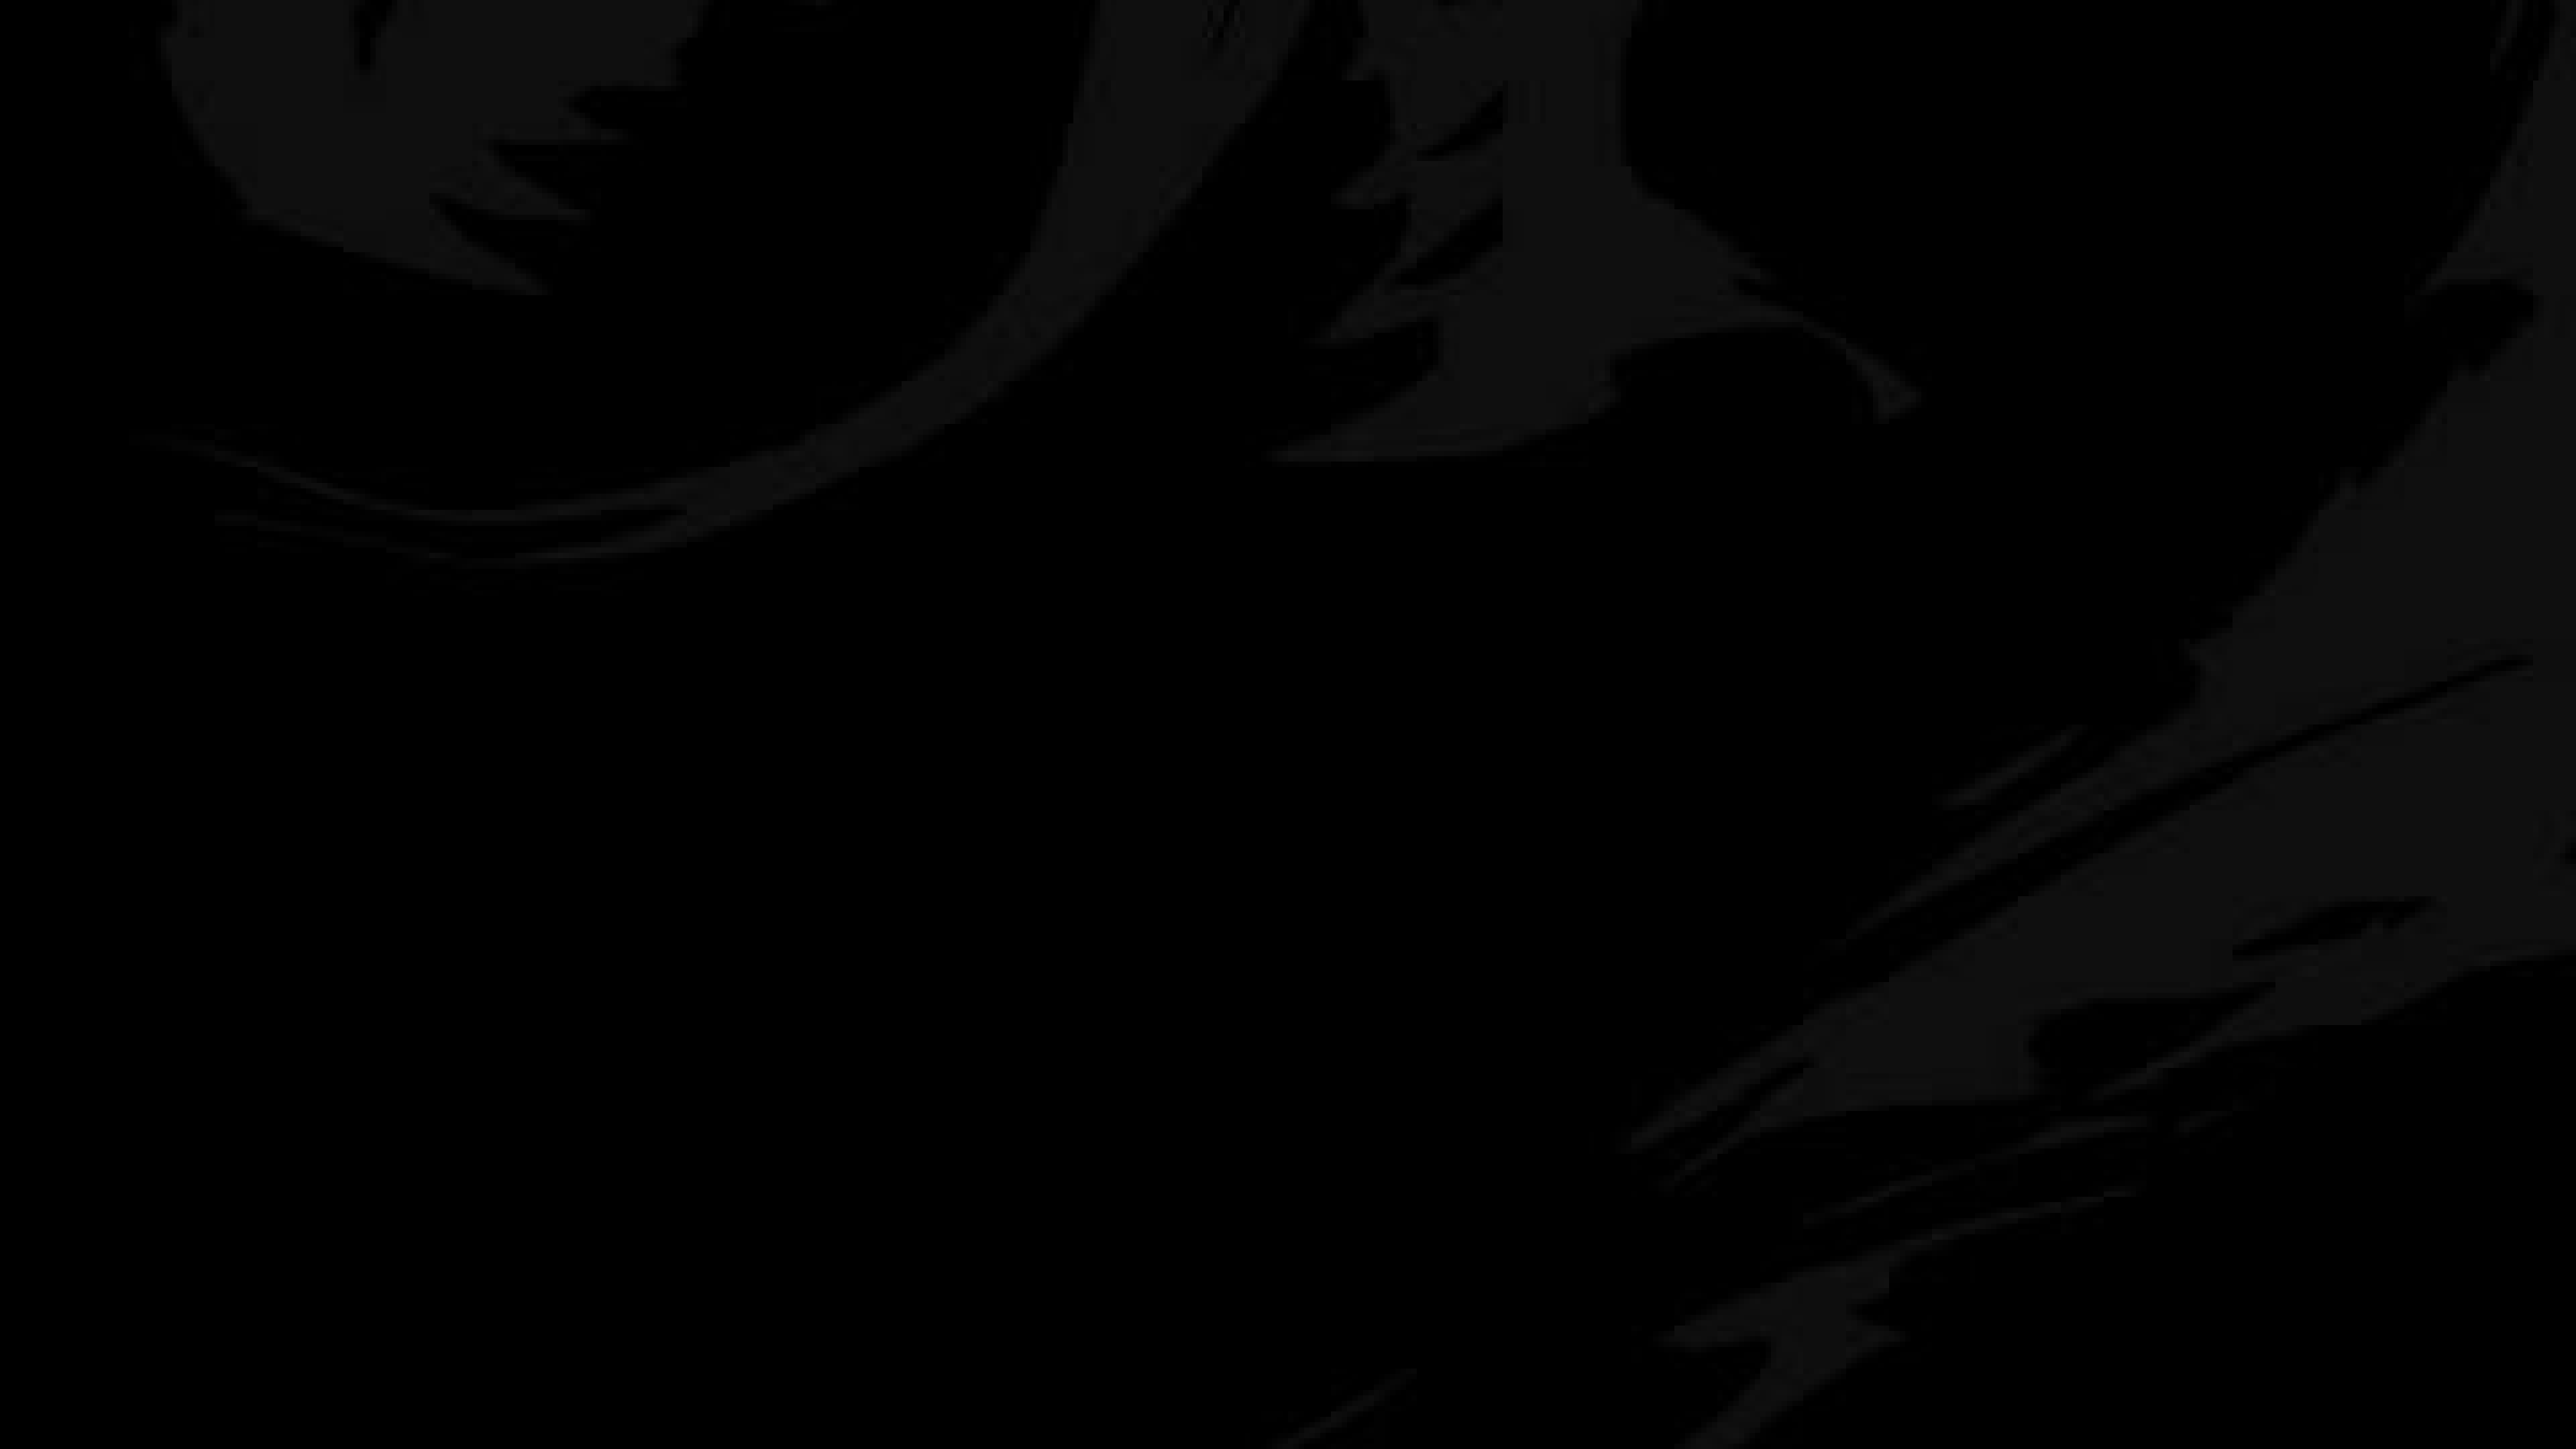 4k Ultra Hd Black Wallpapers Top Free 4k Ultra Hd Black